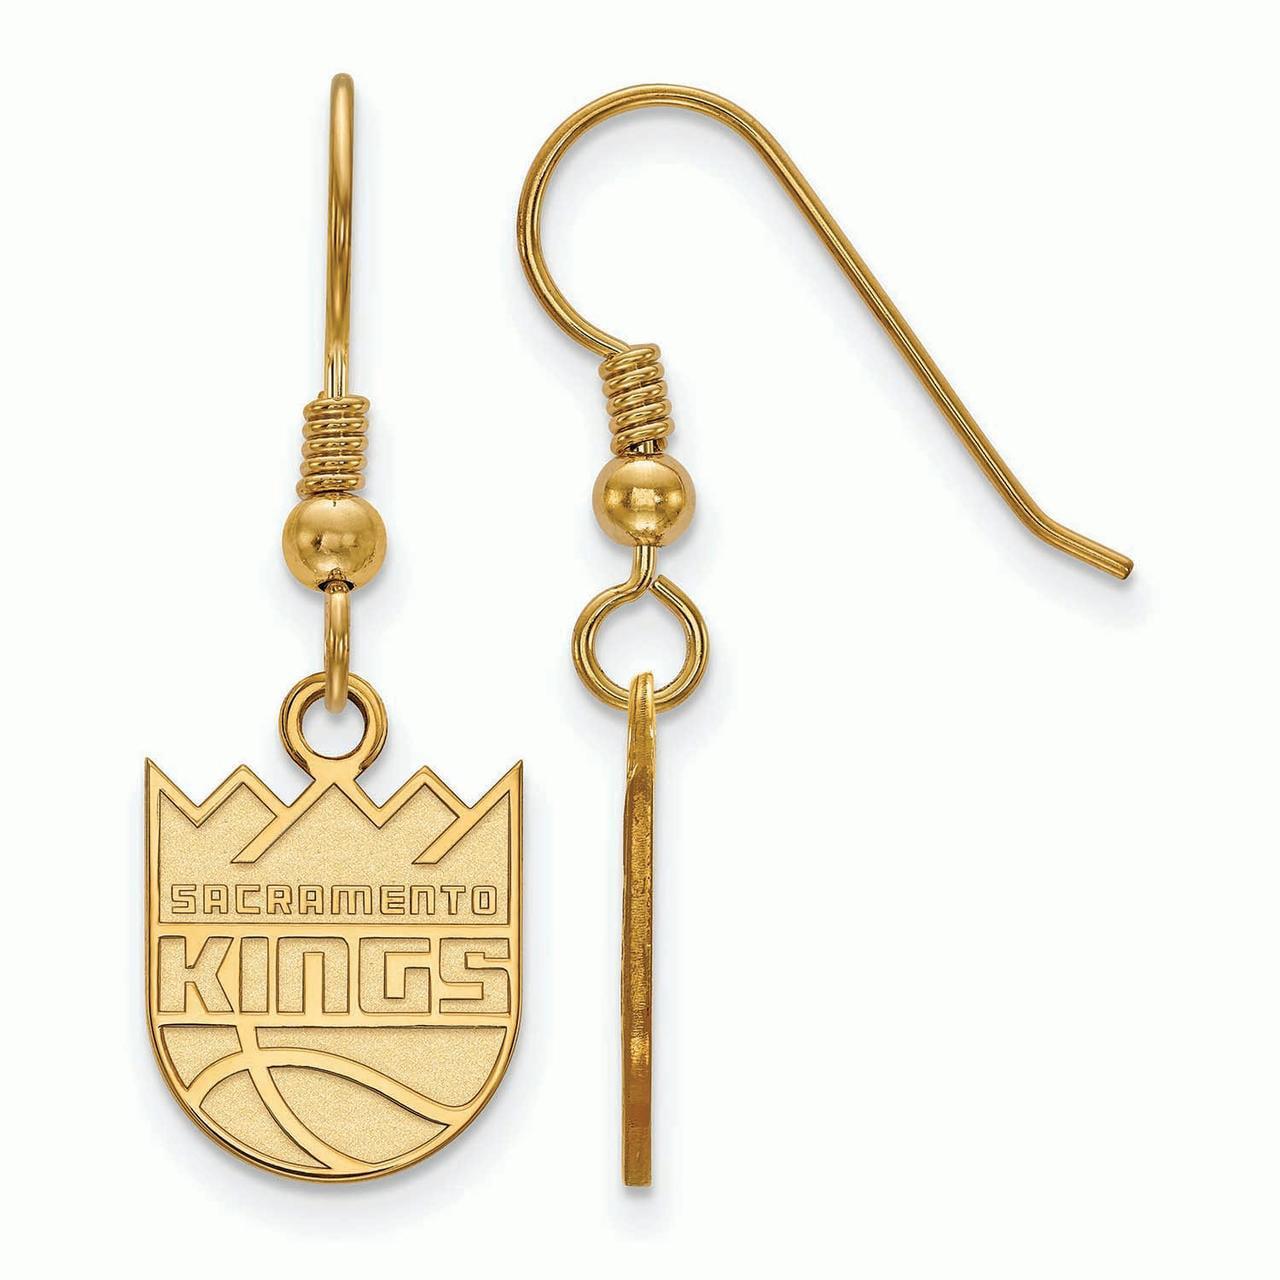 Sacramento Kings Women's Gold Plated XS Dangle Earrings - No Size